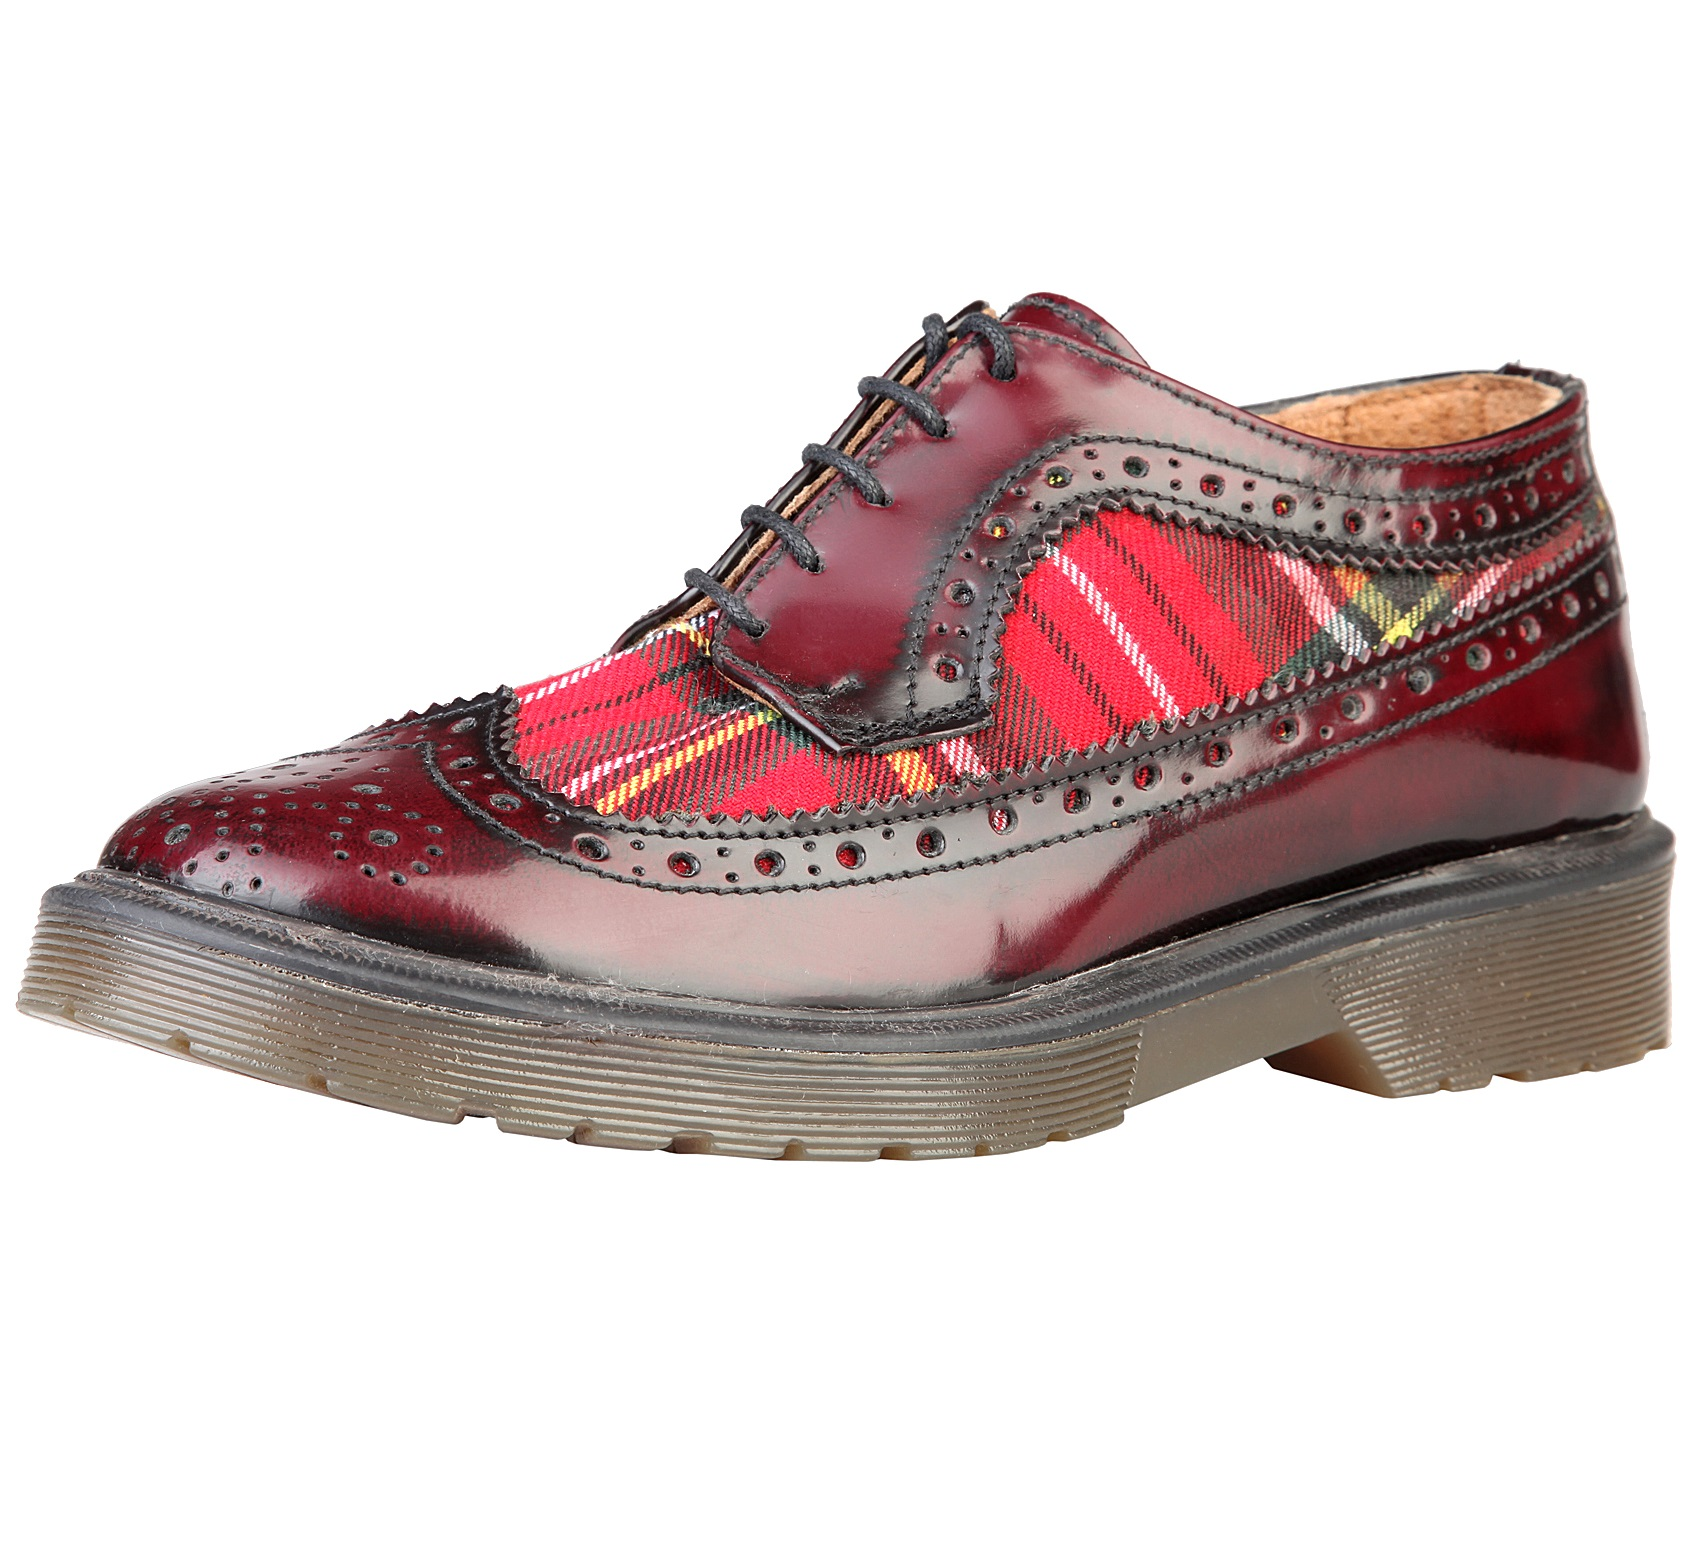 Ana Lublin Urban Shoes Margareta Bordeaux Rf600185